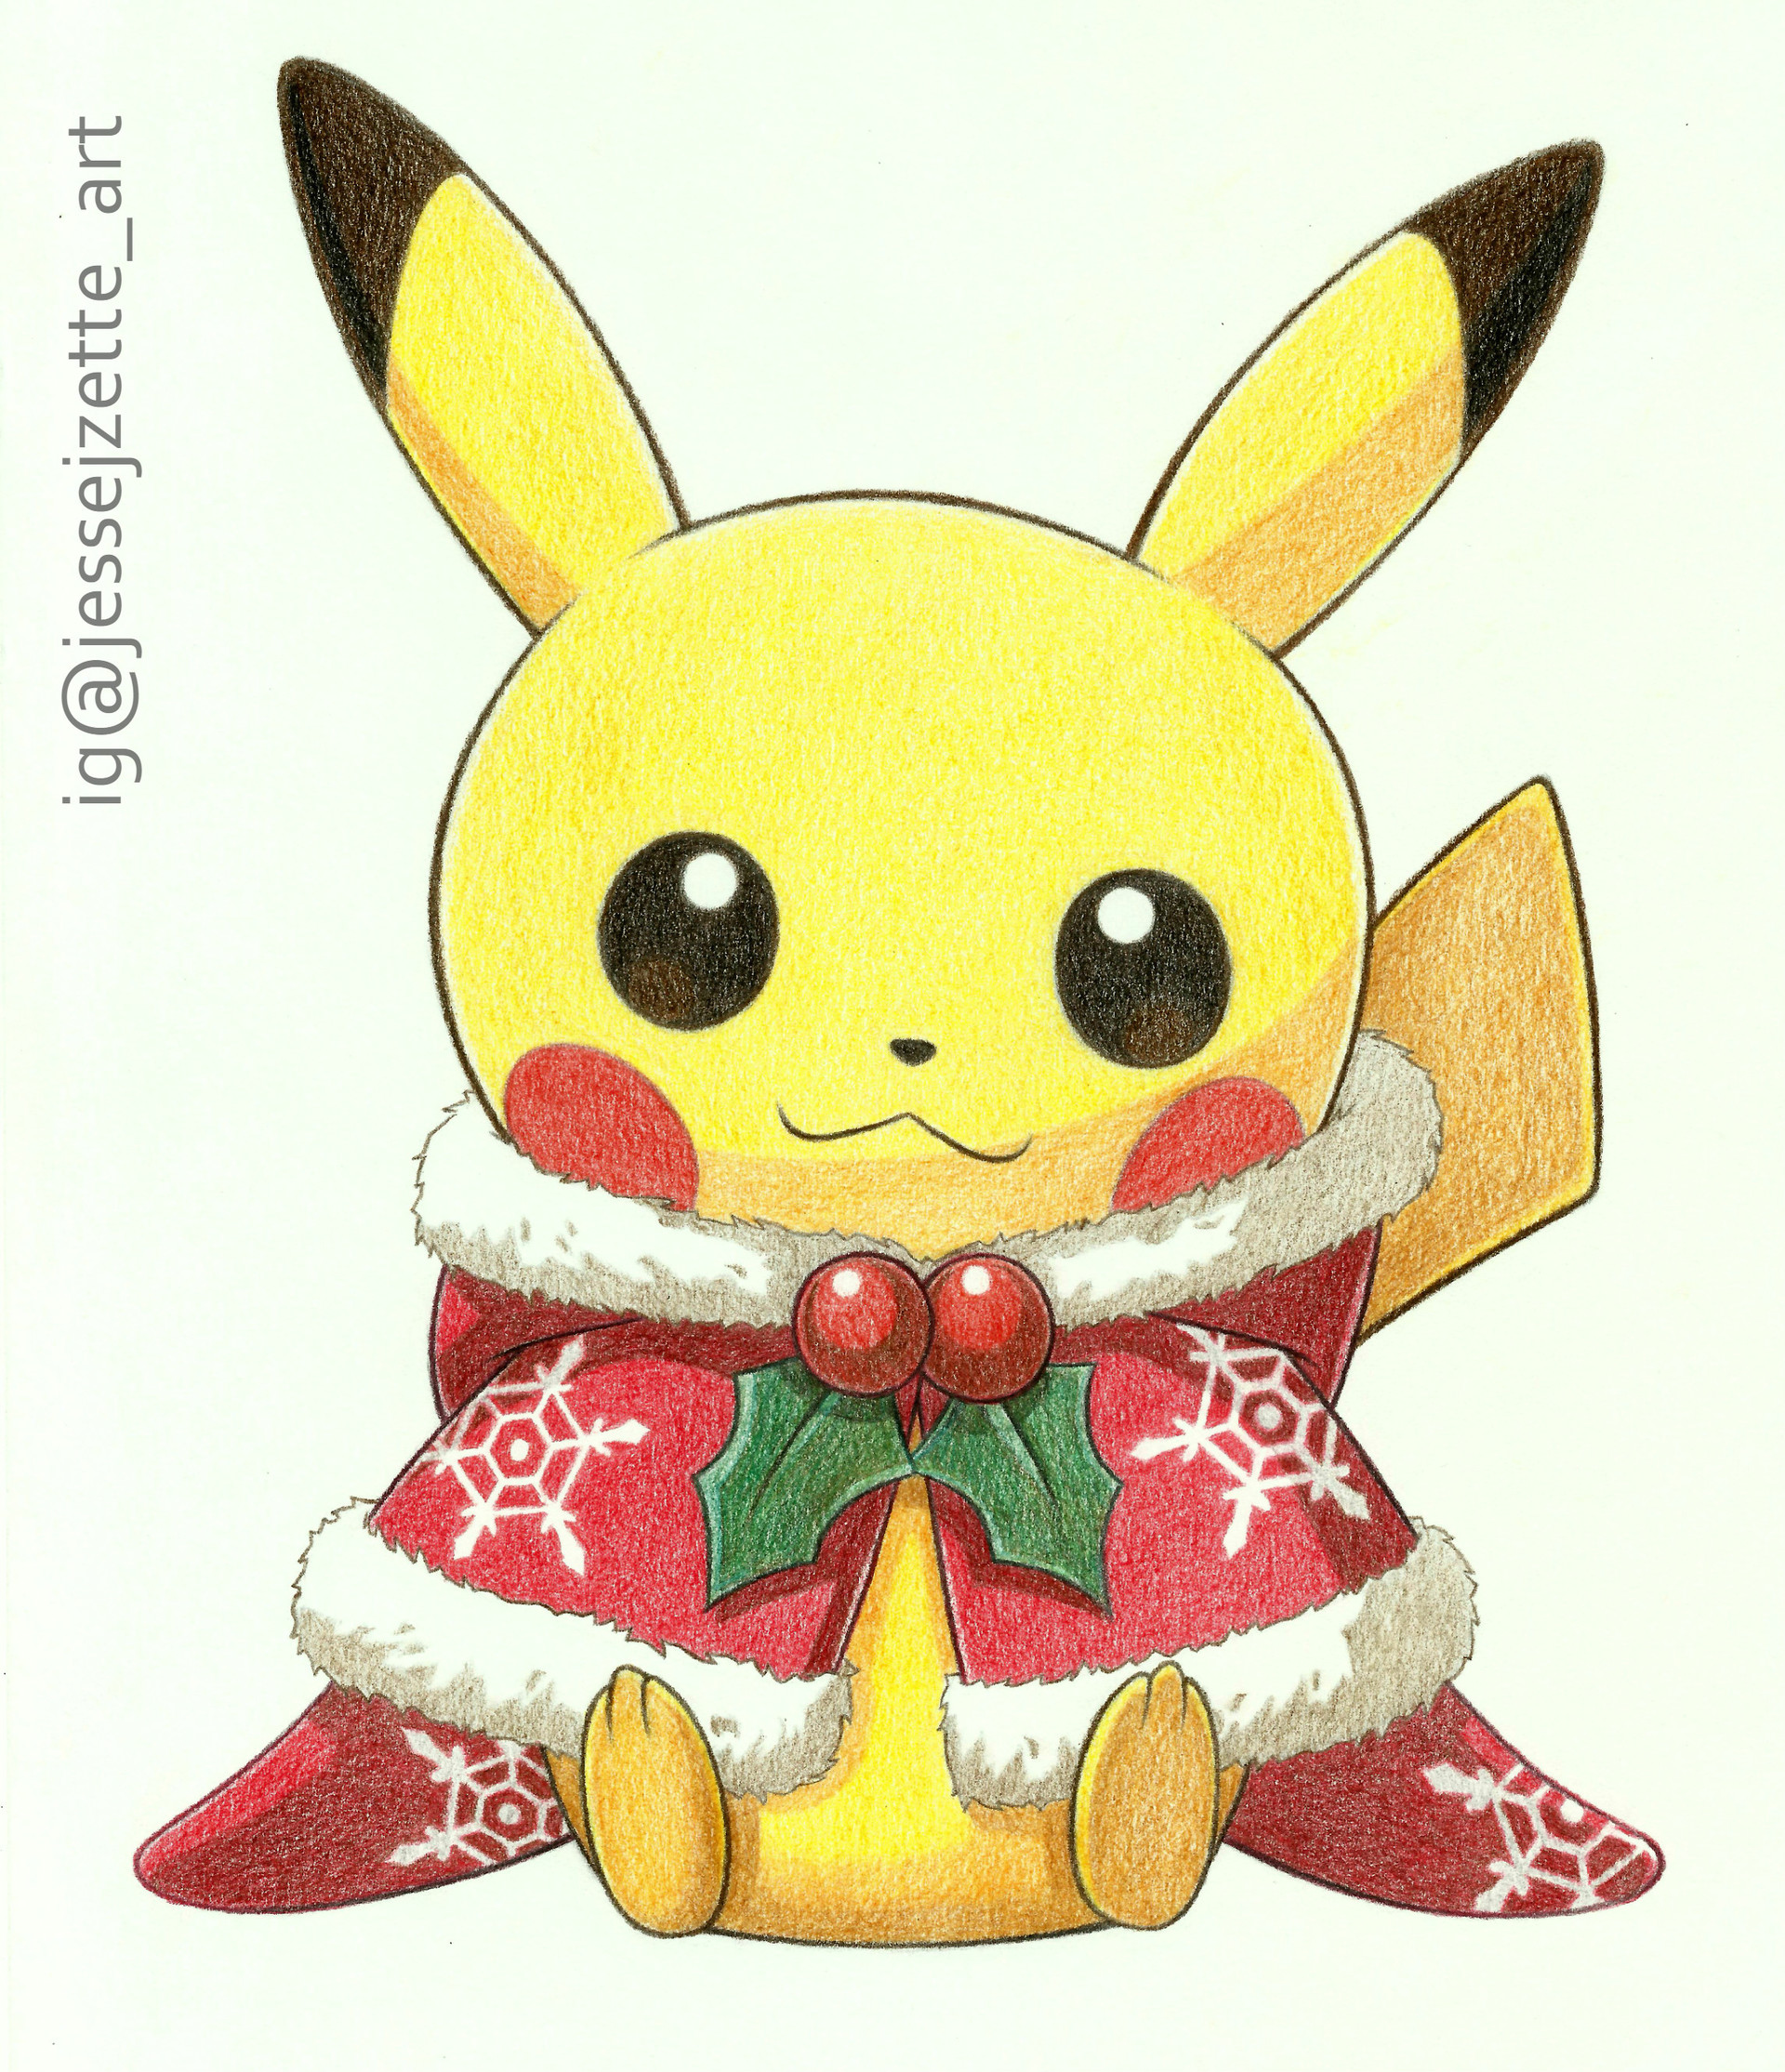 Christmas Pikachu.Artstation Pikachu Christmas 2016 Jesse Jzette Art